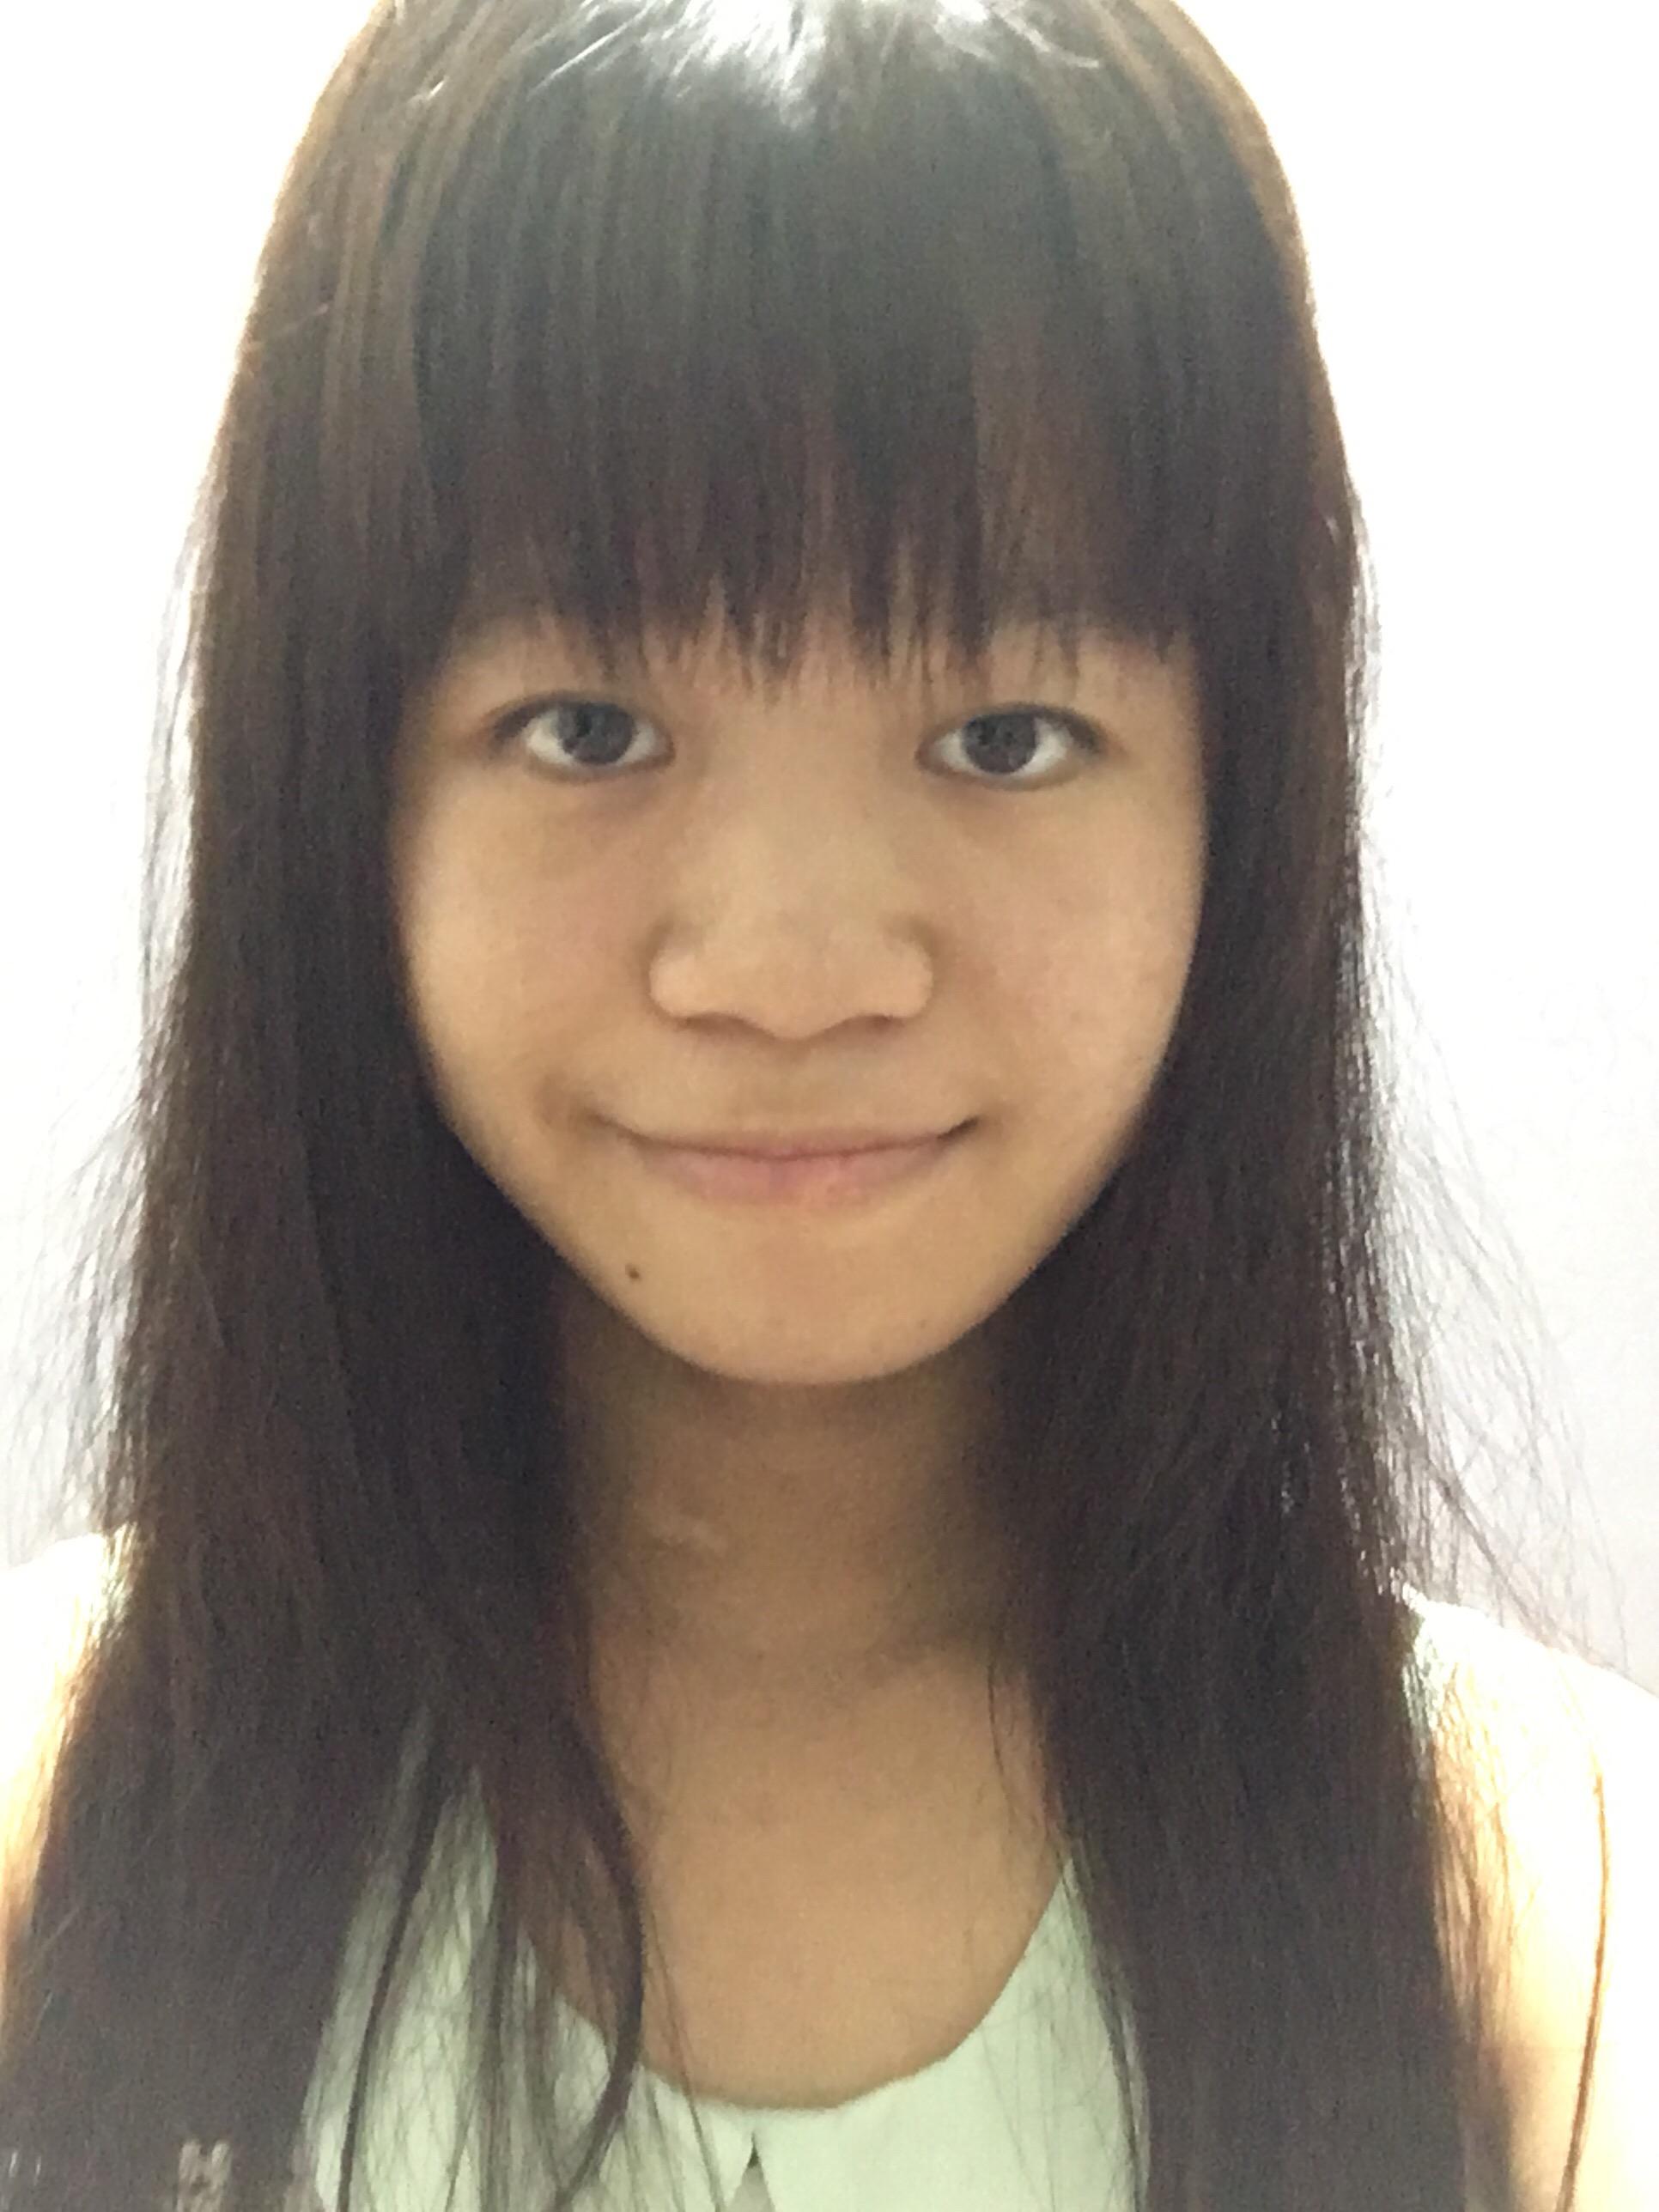 Ms. Teo Ling Xuan